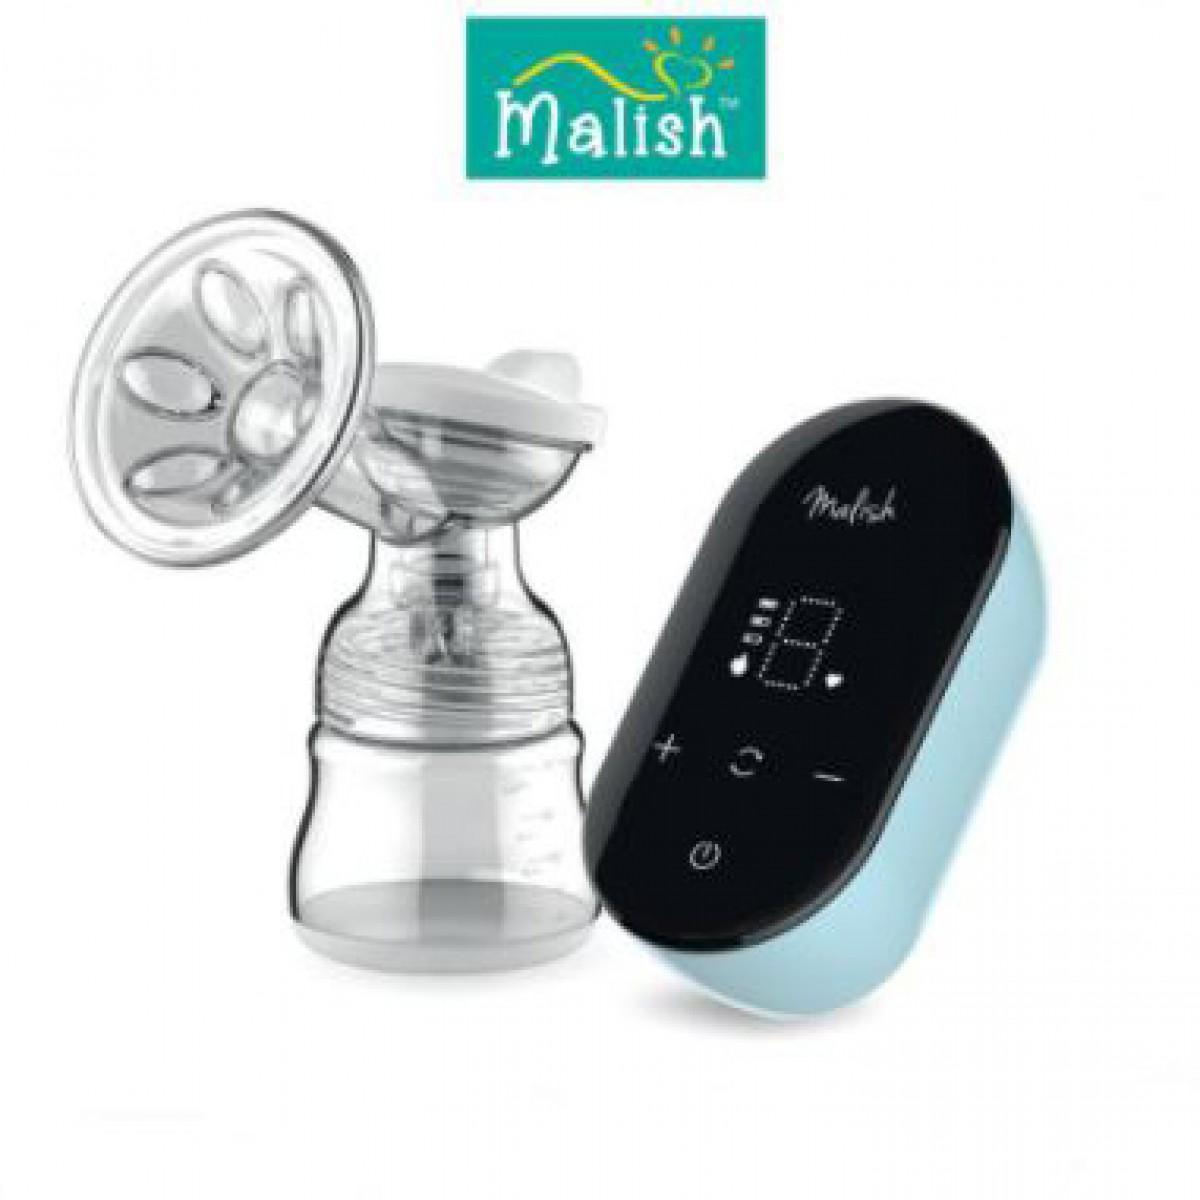 Malish Uno Rechargeble Single Pump - Kico Baby Center